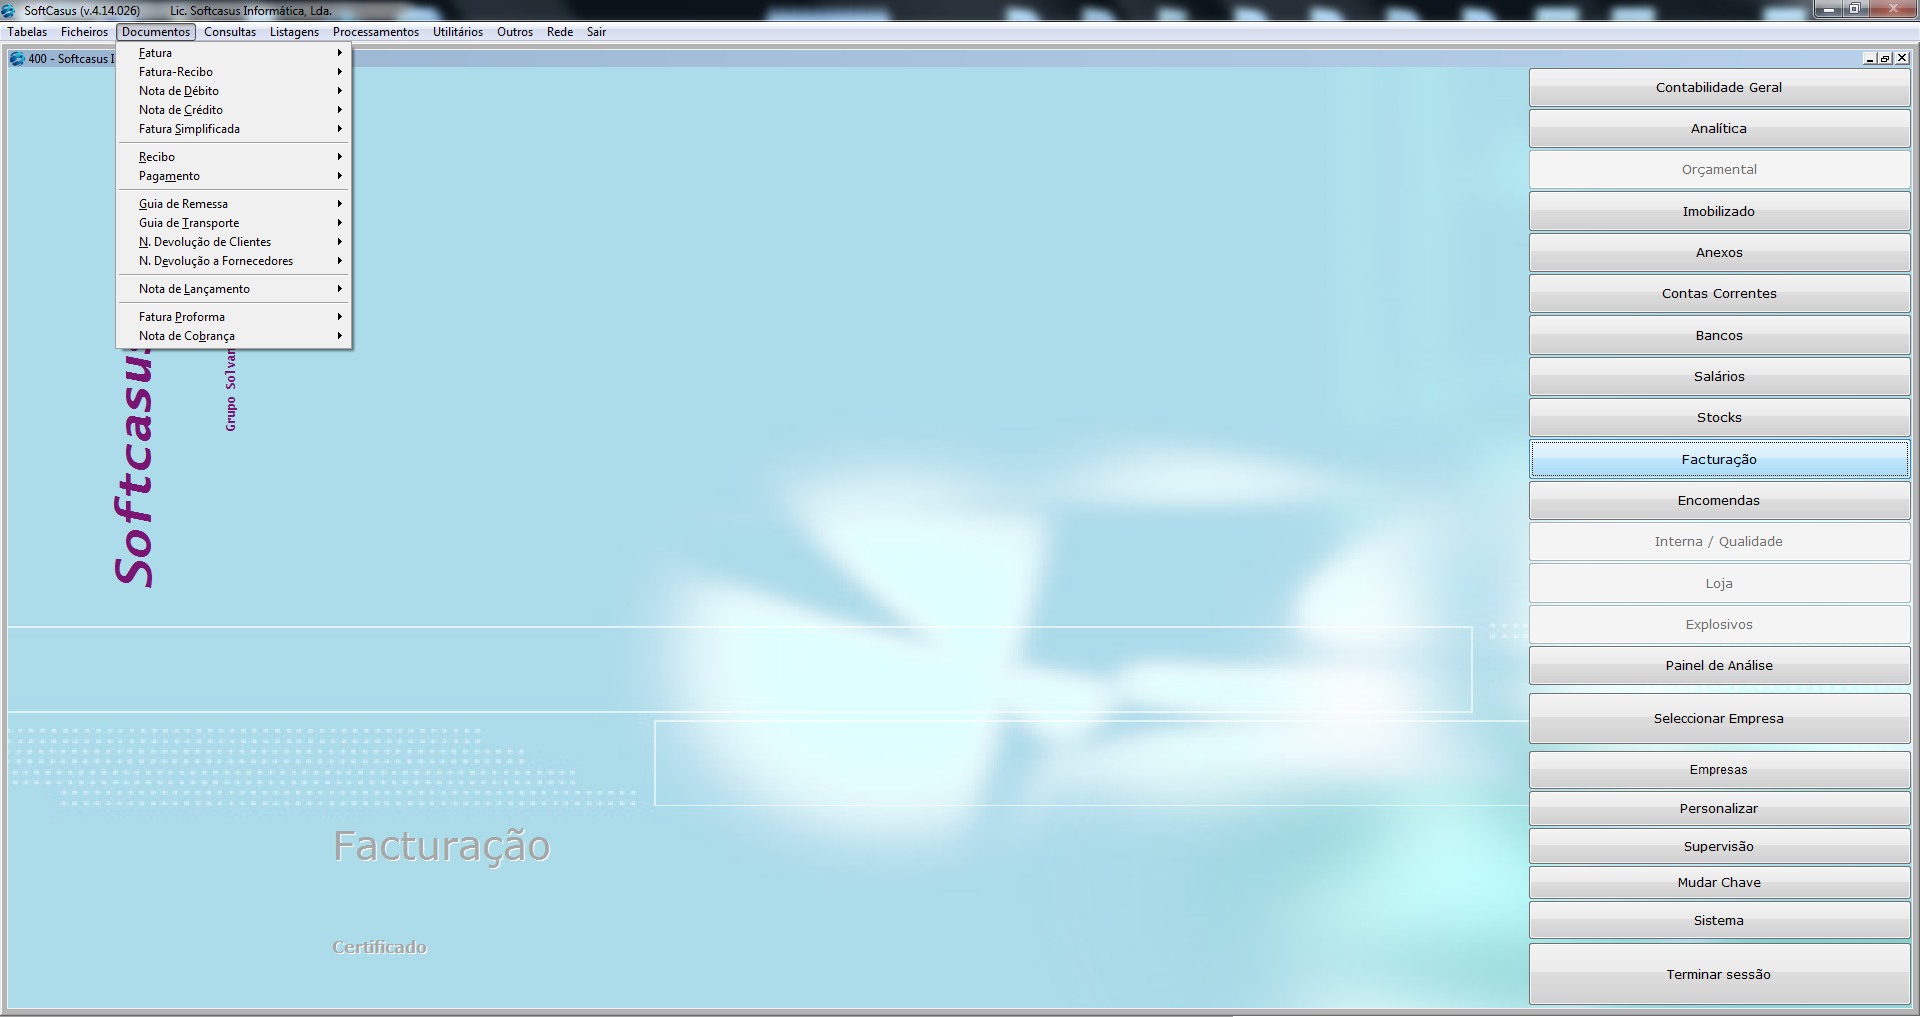 Software Softcasus